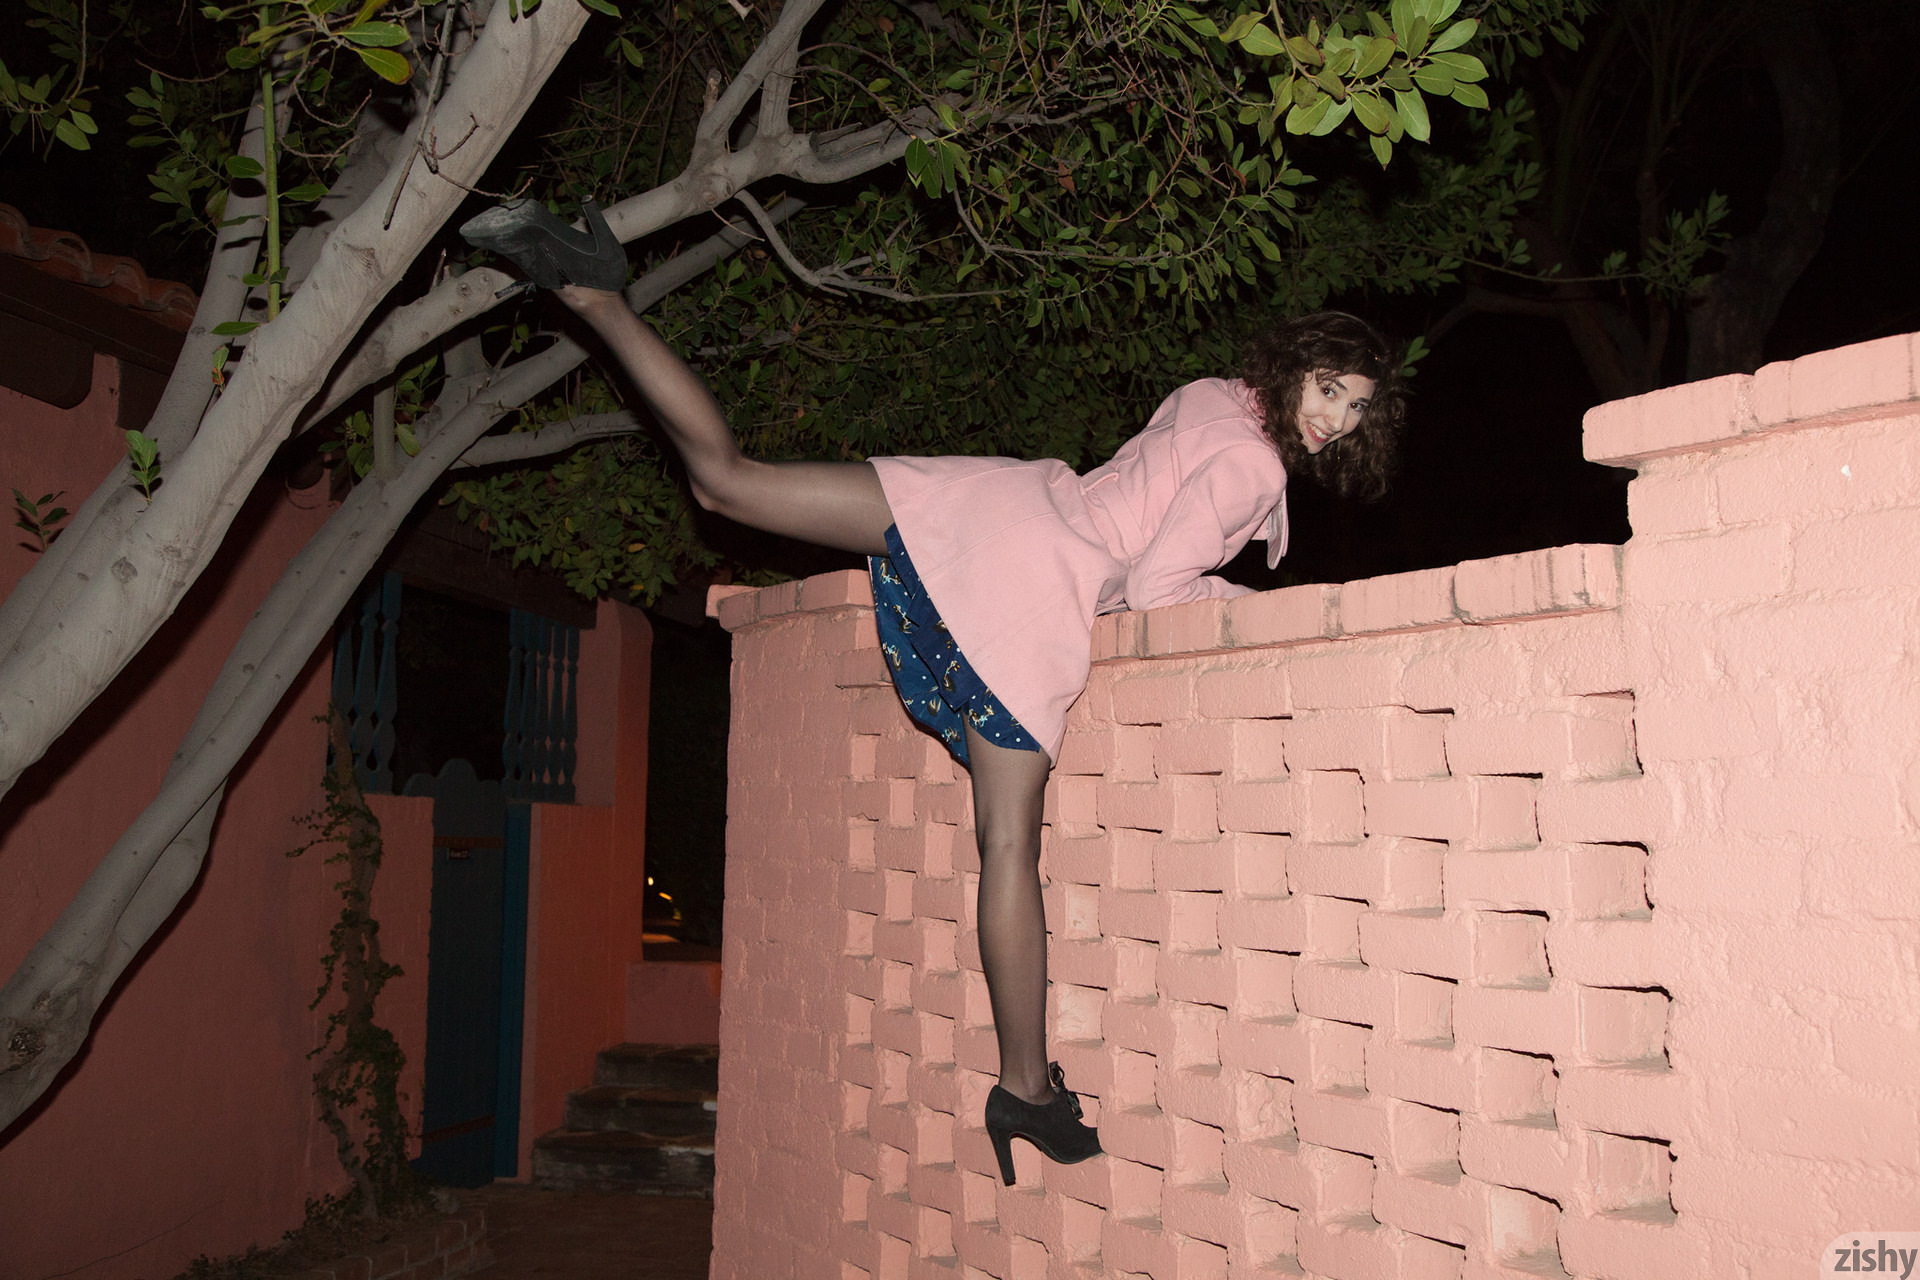 Yvette Nolot At Arizona Inn Zishy (49)